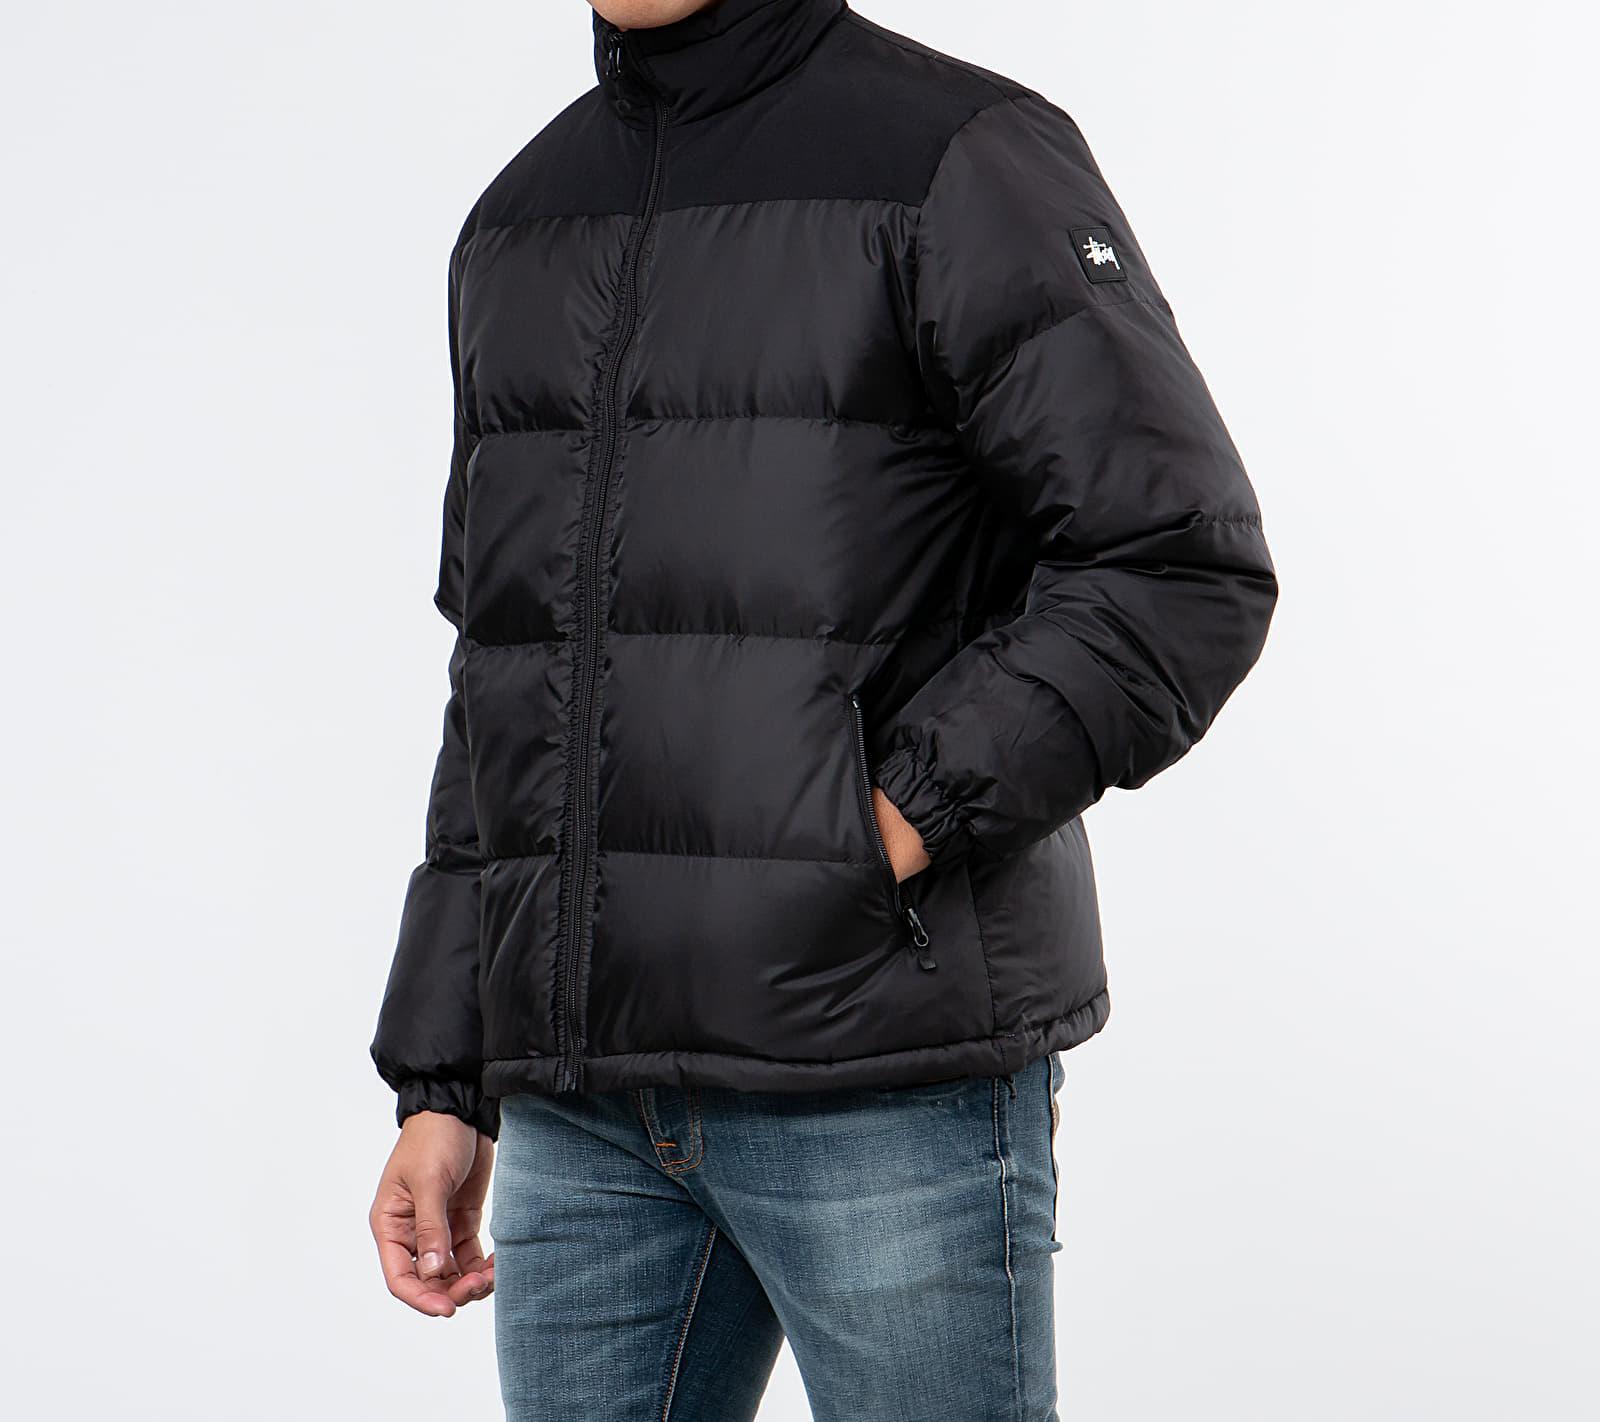 Stüssy Puffer Jacket Black